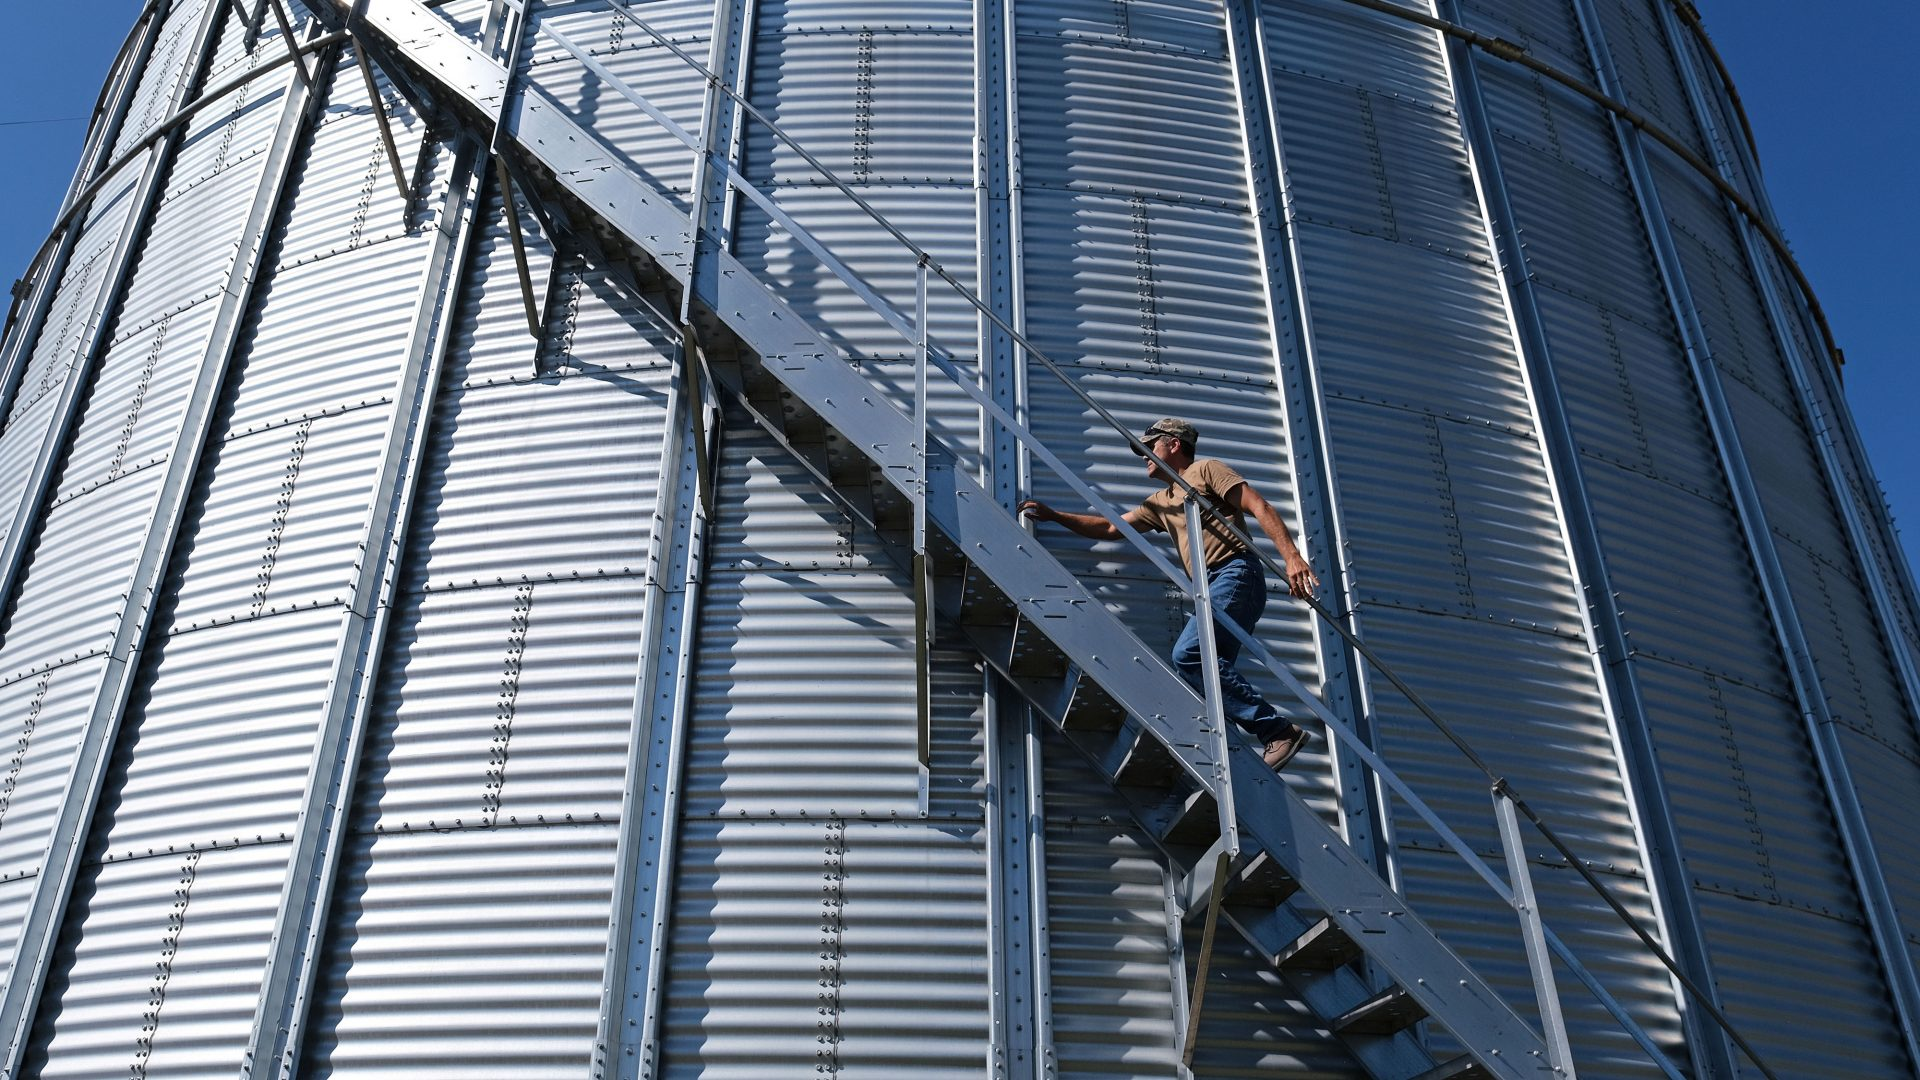 Grain farmer Don Cairns walks to the top of a grain silo Sept. 25, 2019, at Cairns Family Farm in Sadsbury Township, Pennsylvania.